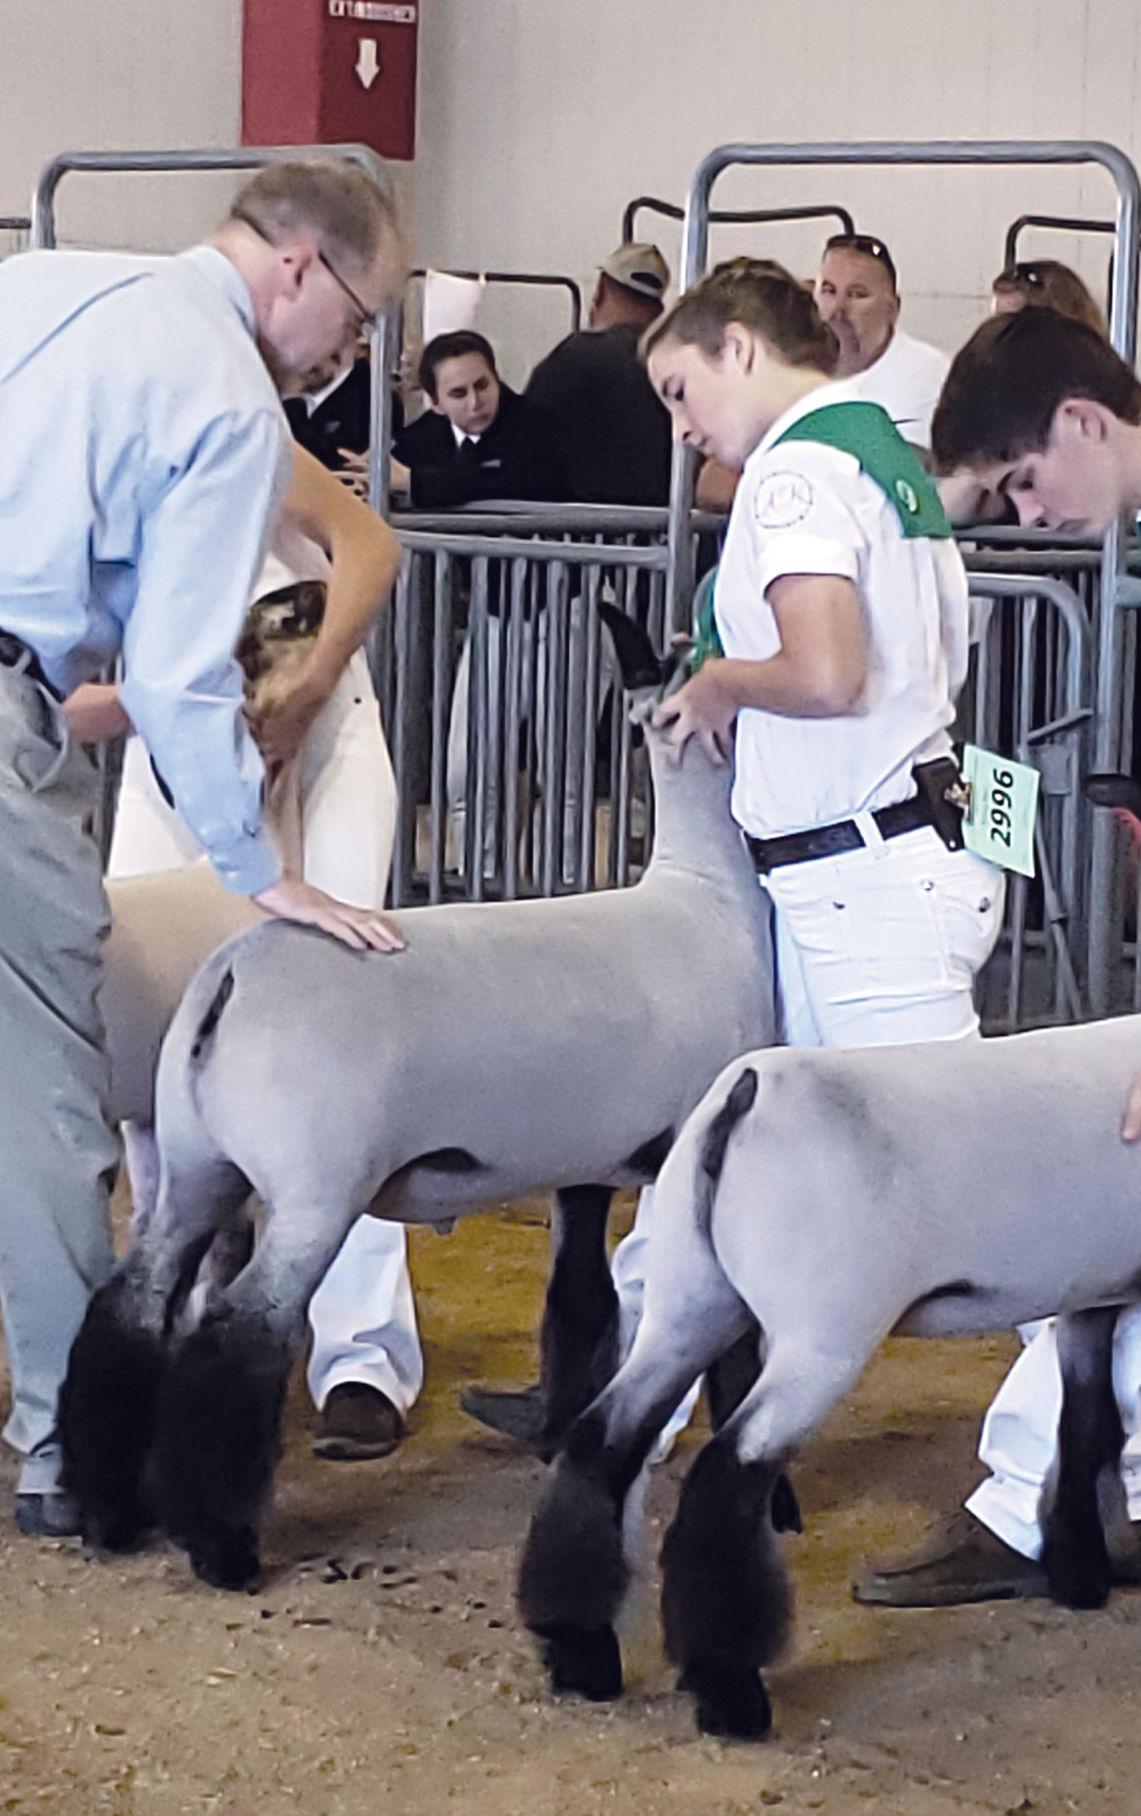 Livestock competition